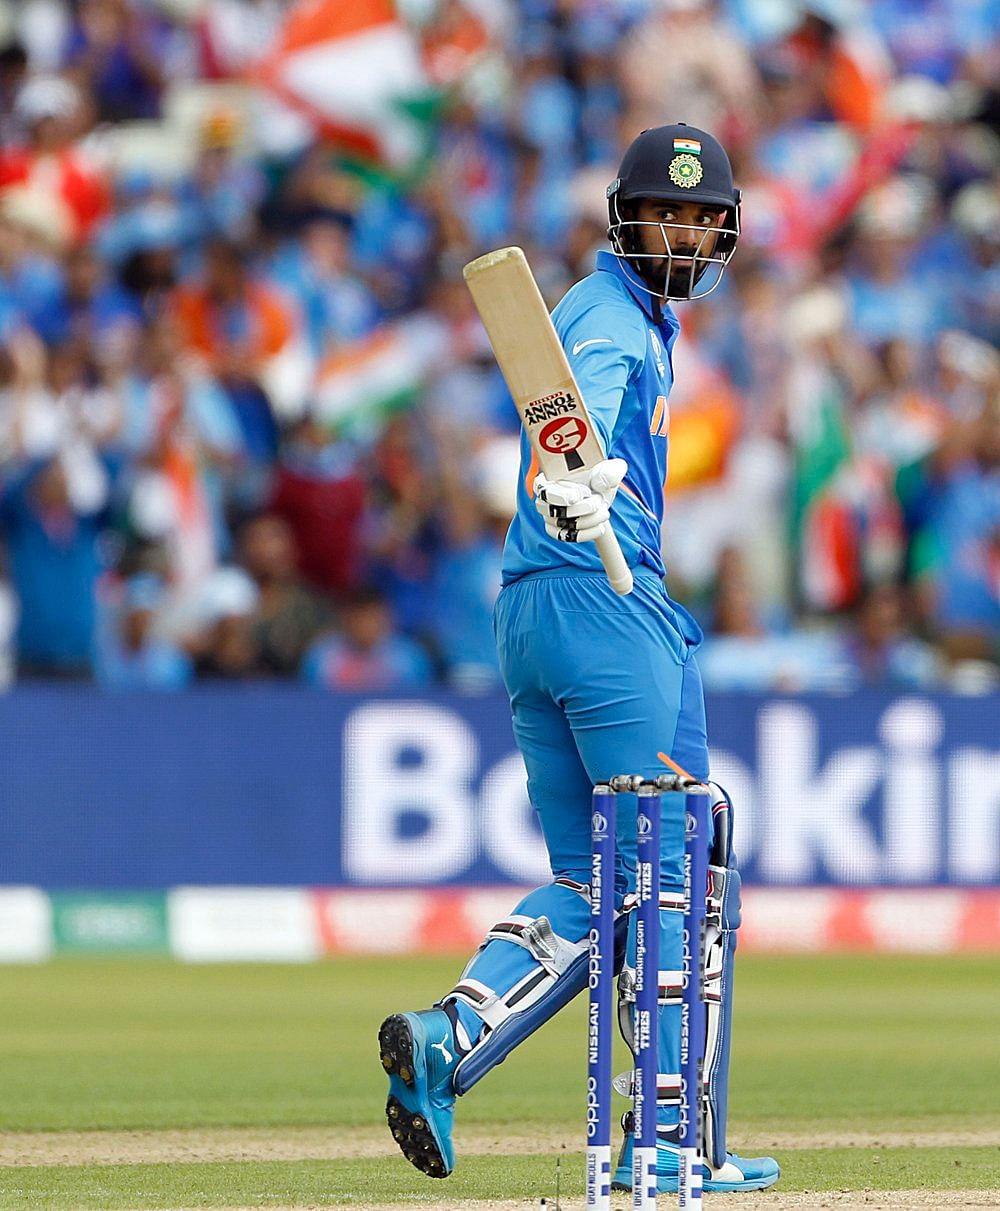 Indian batsman Lokesh Rahul celebrates his half-century during a match against Bangladesh in ICC CWC 2019 at Edgbaston in Birmingham on Tuesday